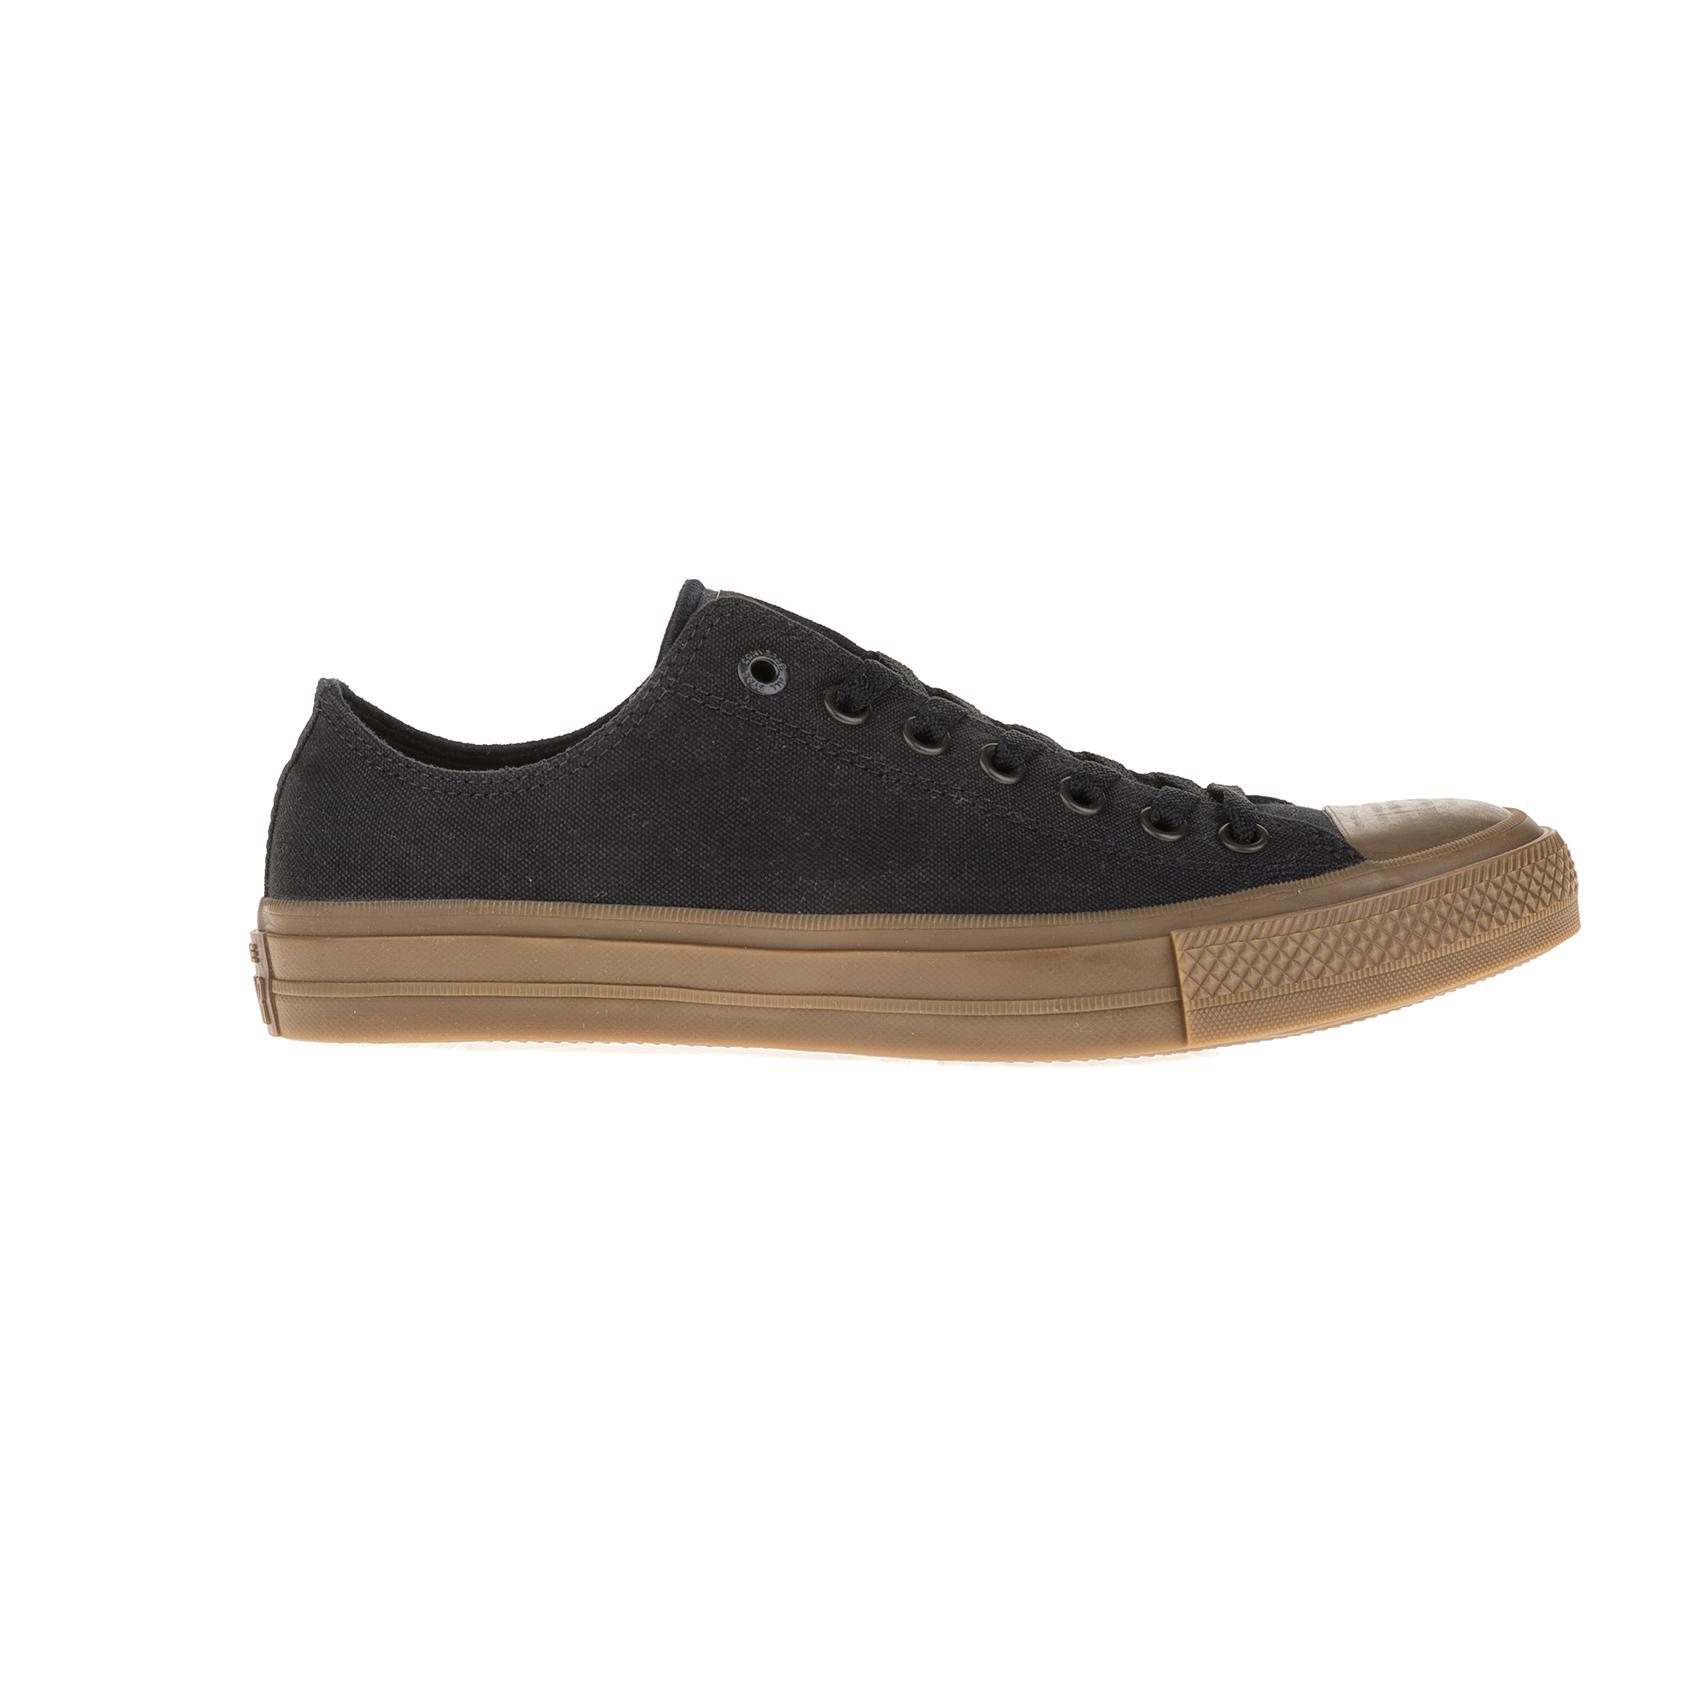 CONVERSE – Unisex παπούτσια Chuck Taylor All Star II Ox μαύρα